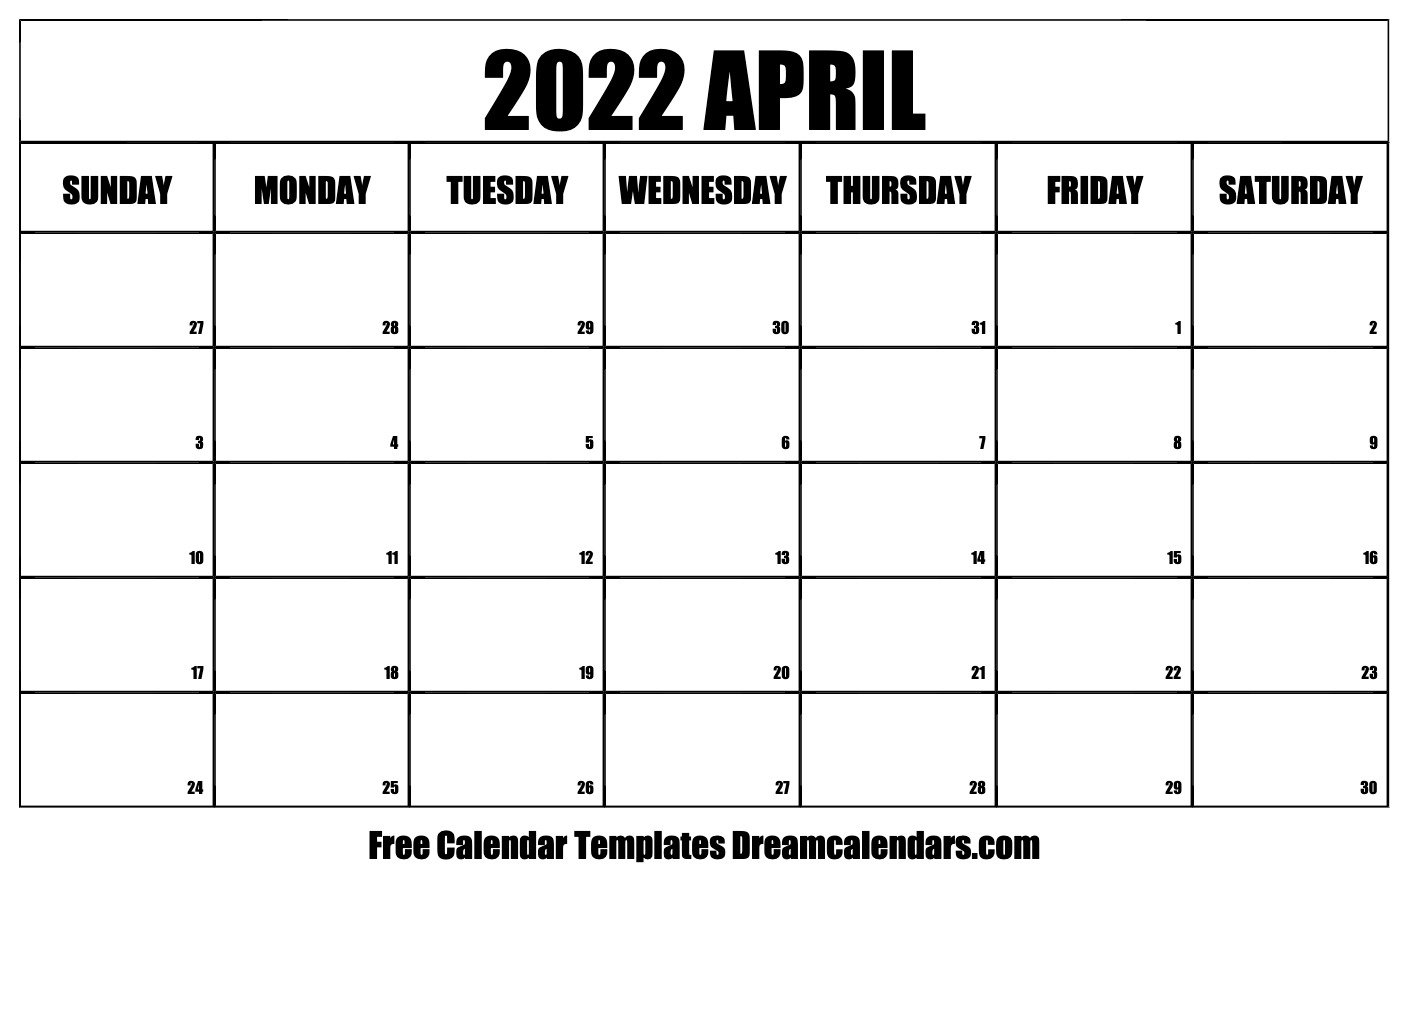 April 2022 Calendar | Free Blank Printable Templates intended for March April 2022 Printable Calendar